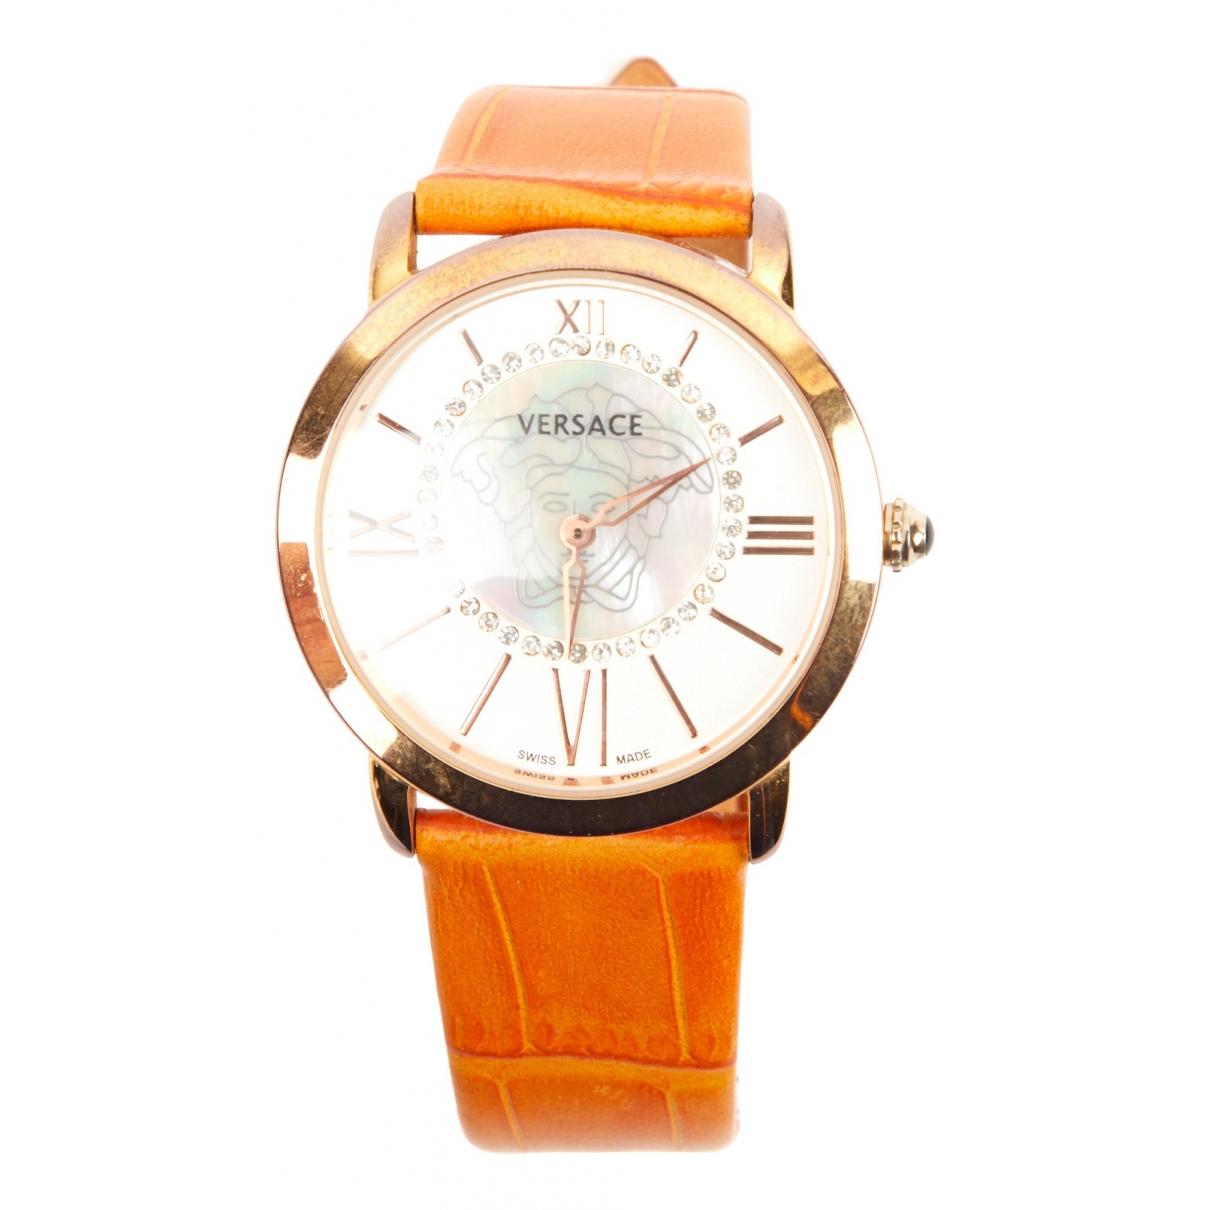 Versace N Camel Steel watch for Women N